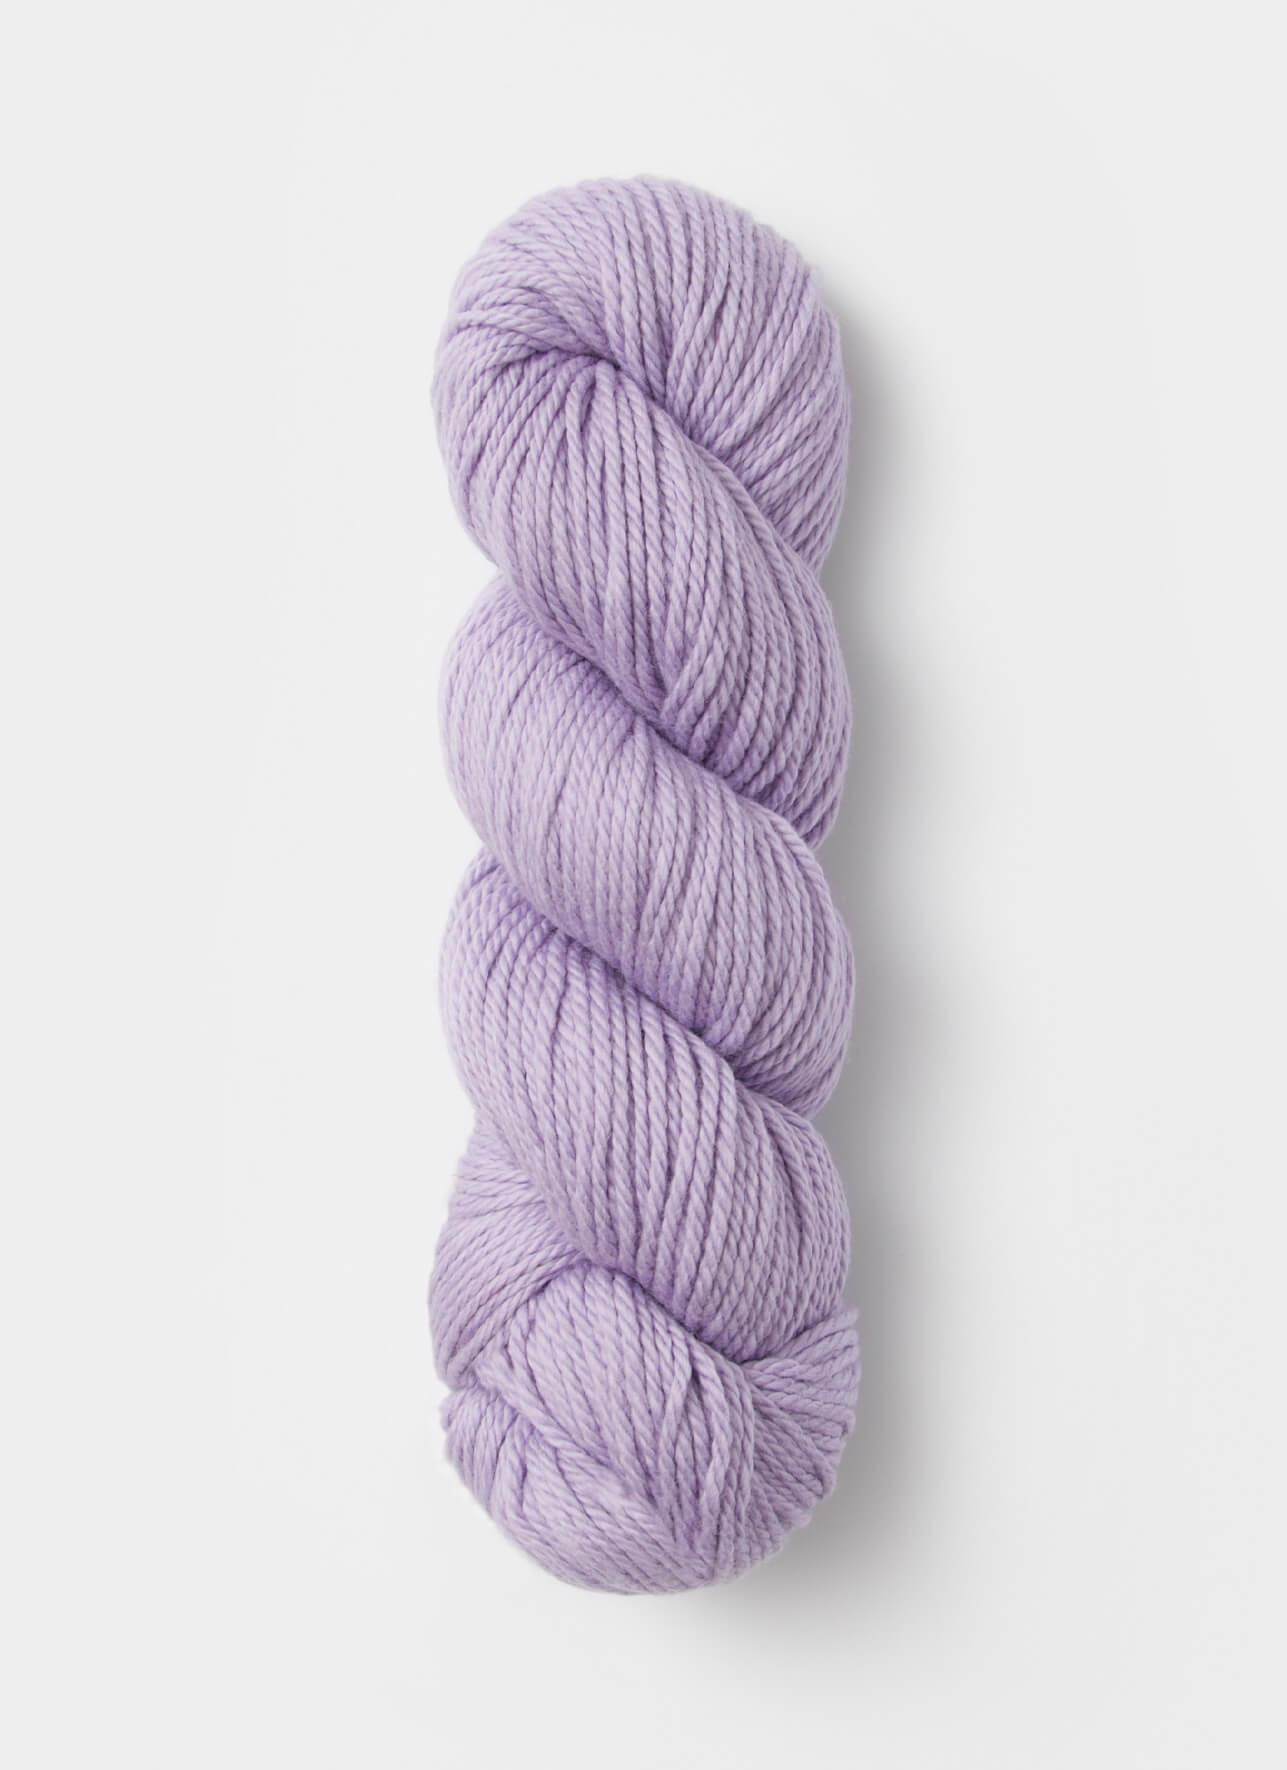 No. 7523: Lilac